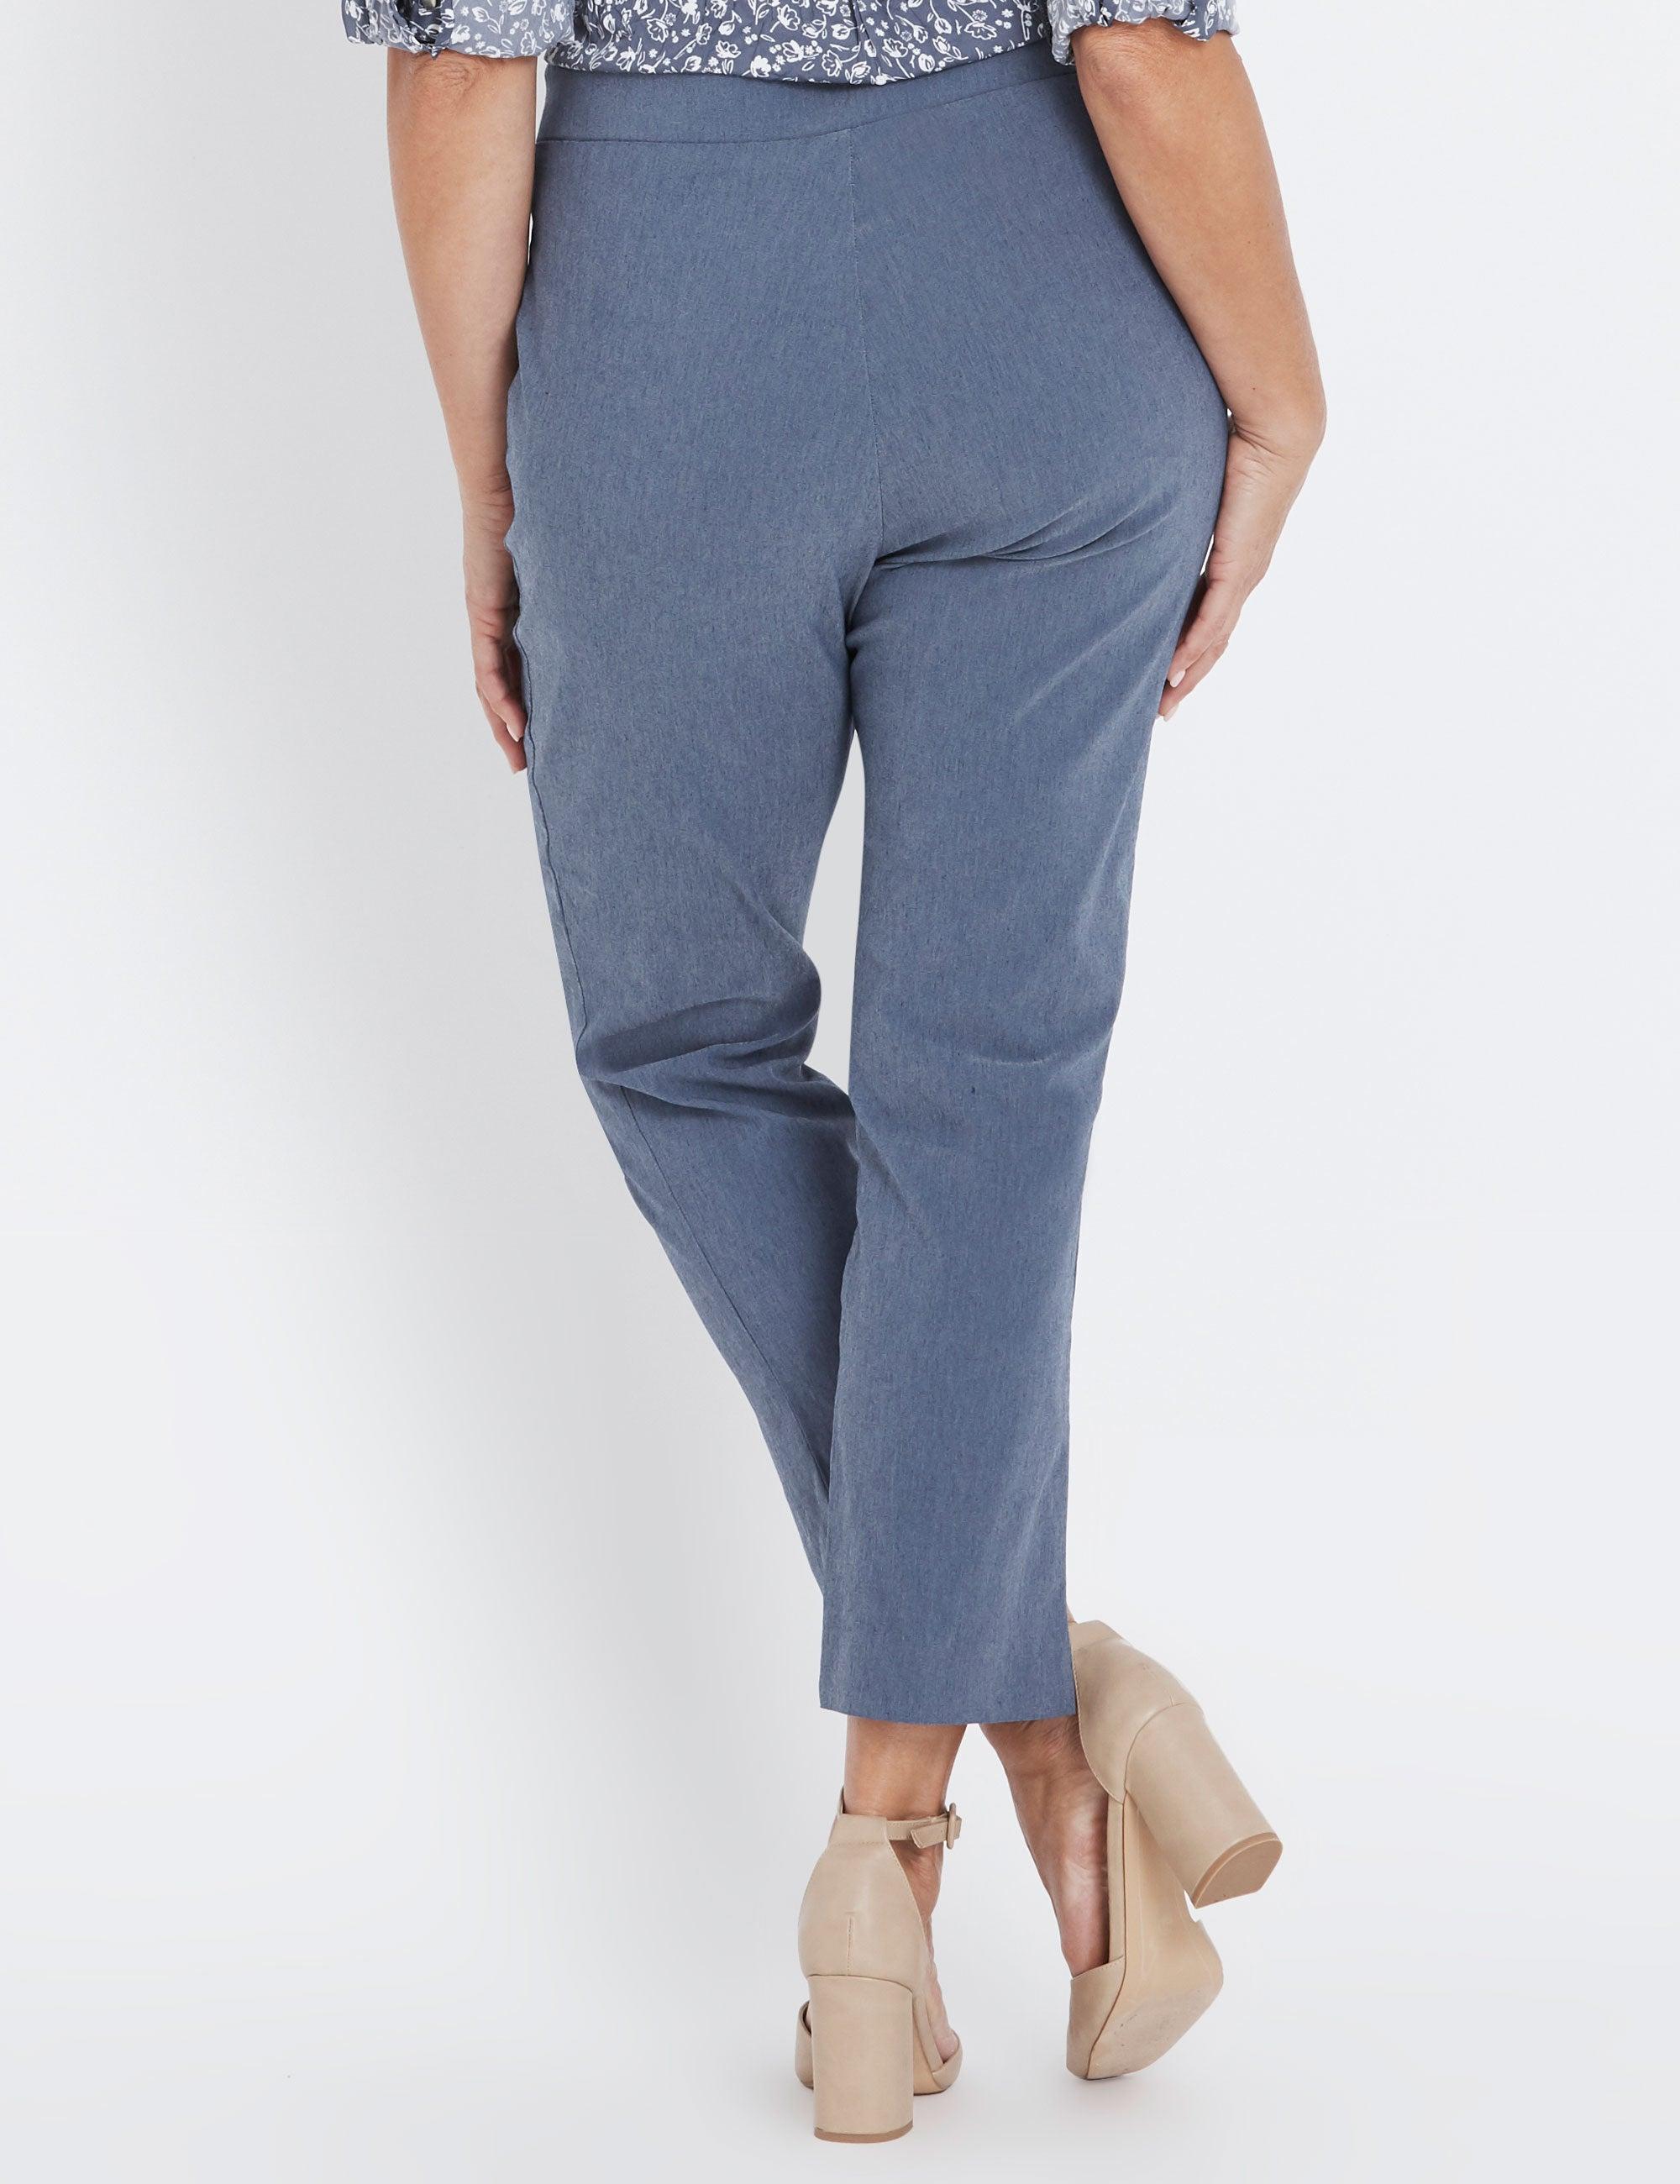 Vigorella Bengaline High Waisted Pant Brand New